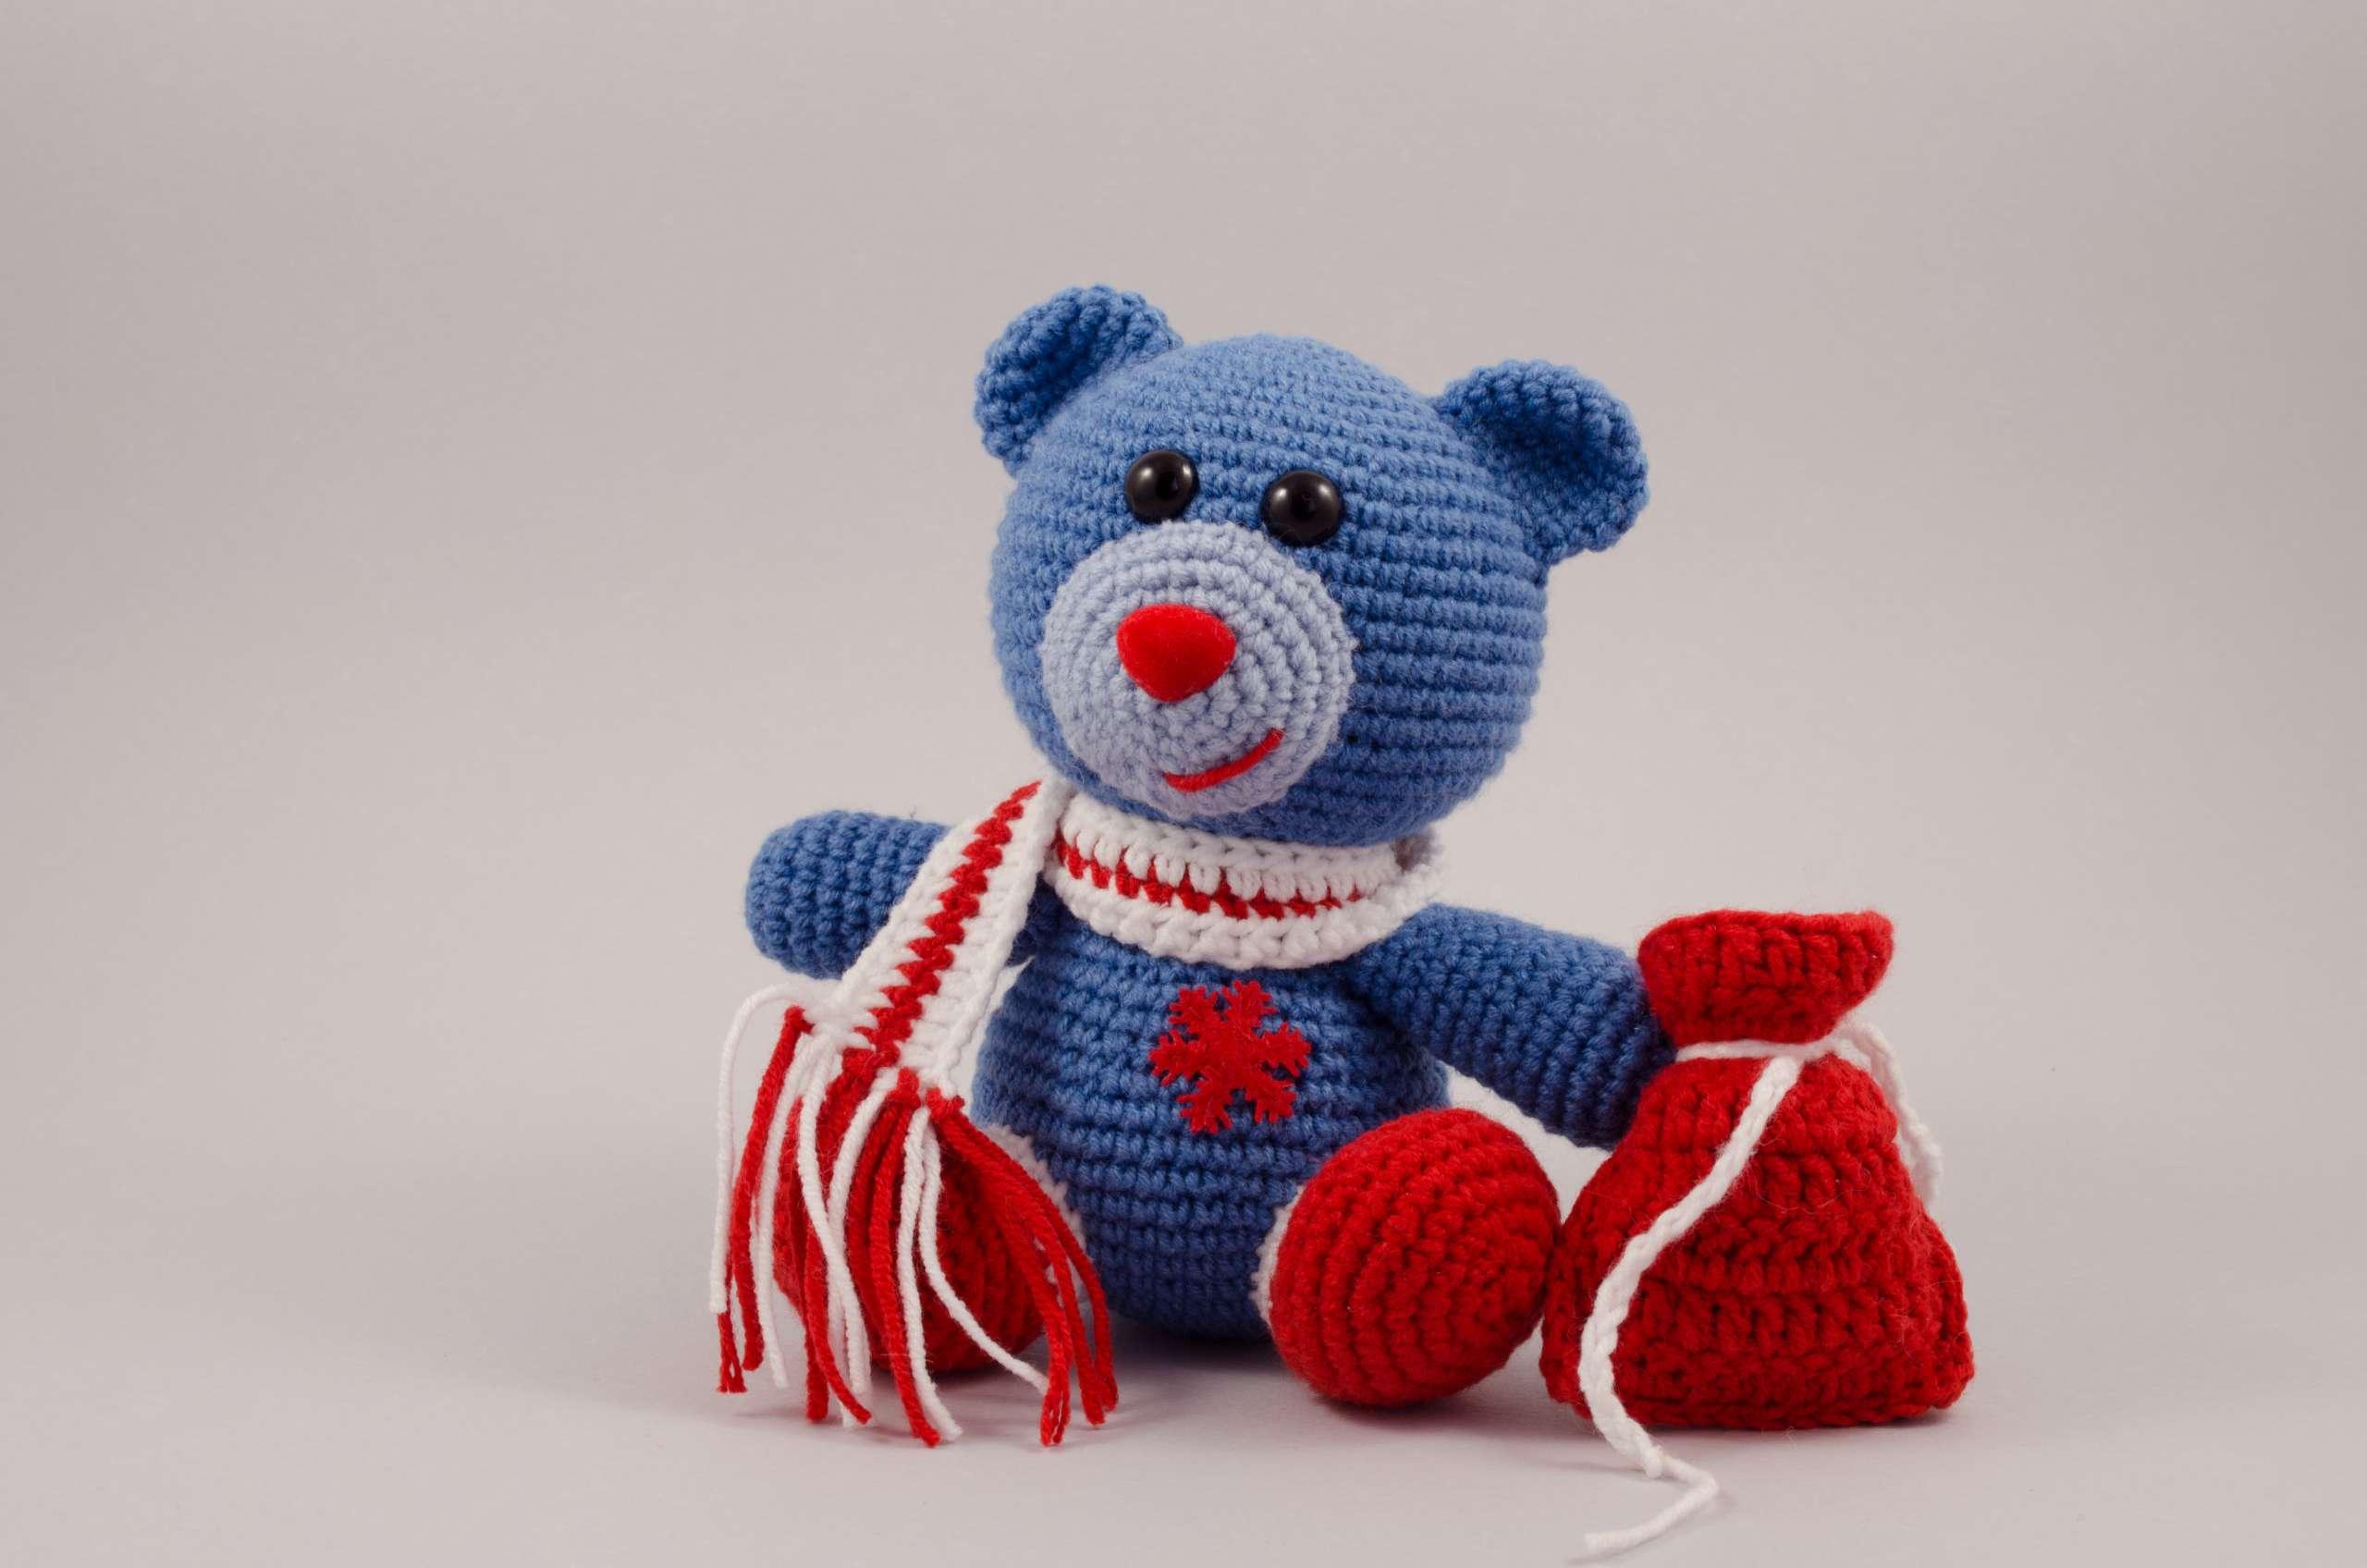 crochet Christmas bear front view